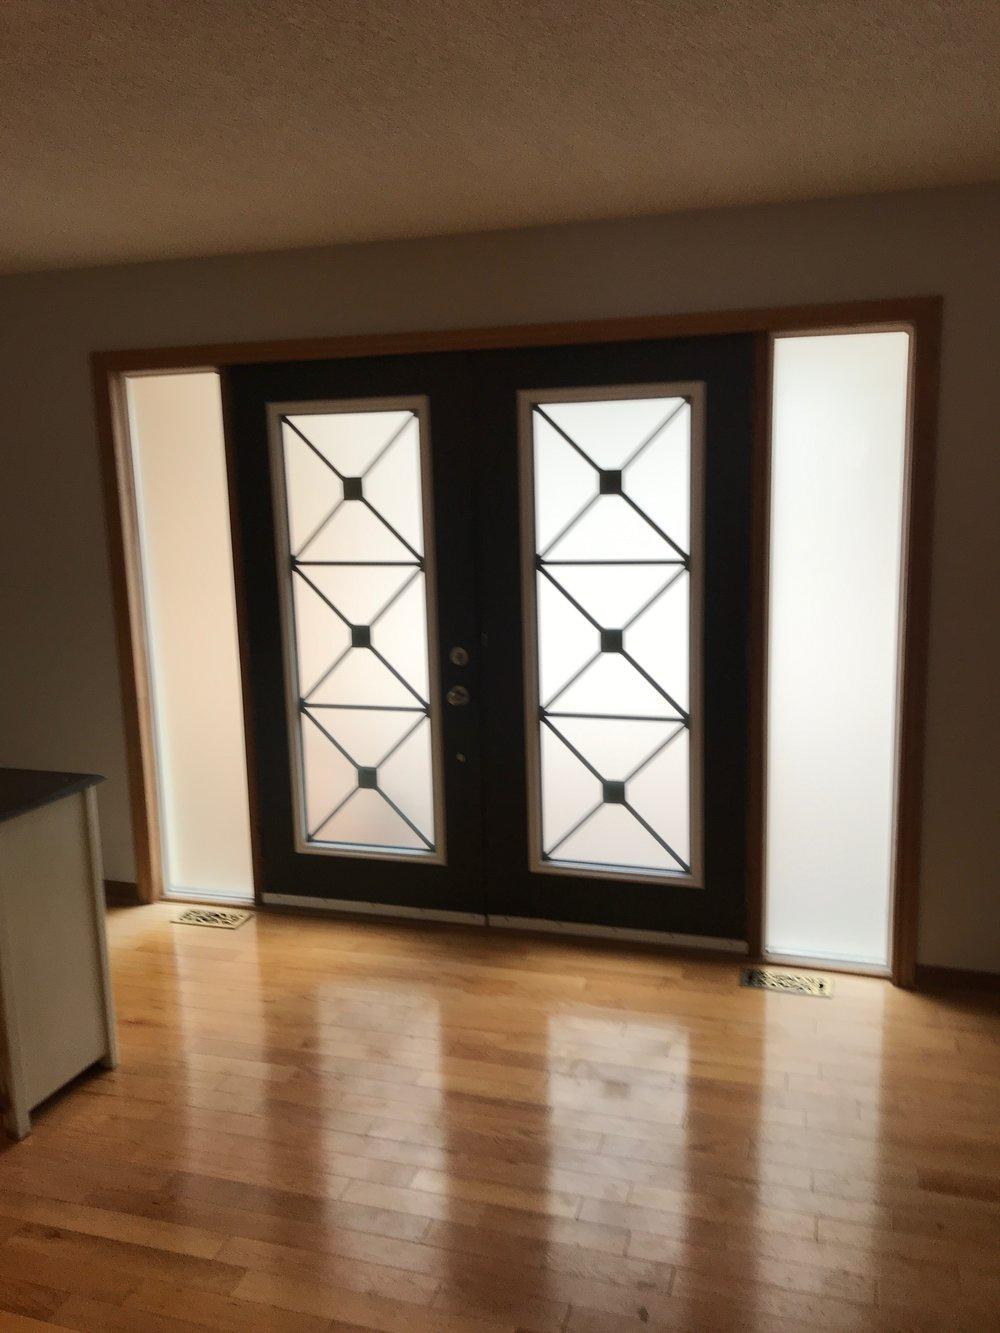 X-Design-Wrought-Iron-Glass-Door-Inserts-Sutton-Ontario